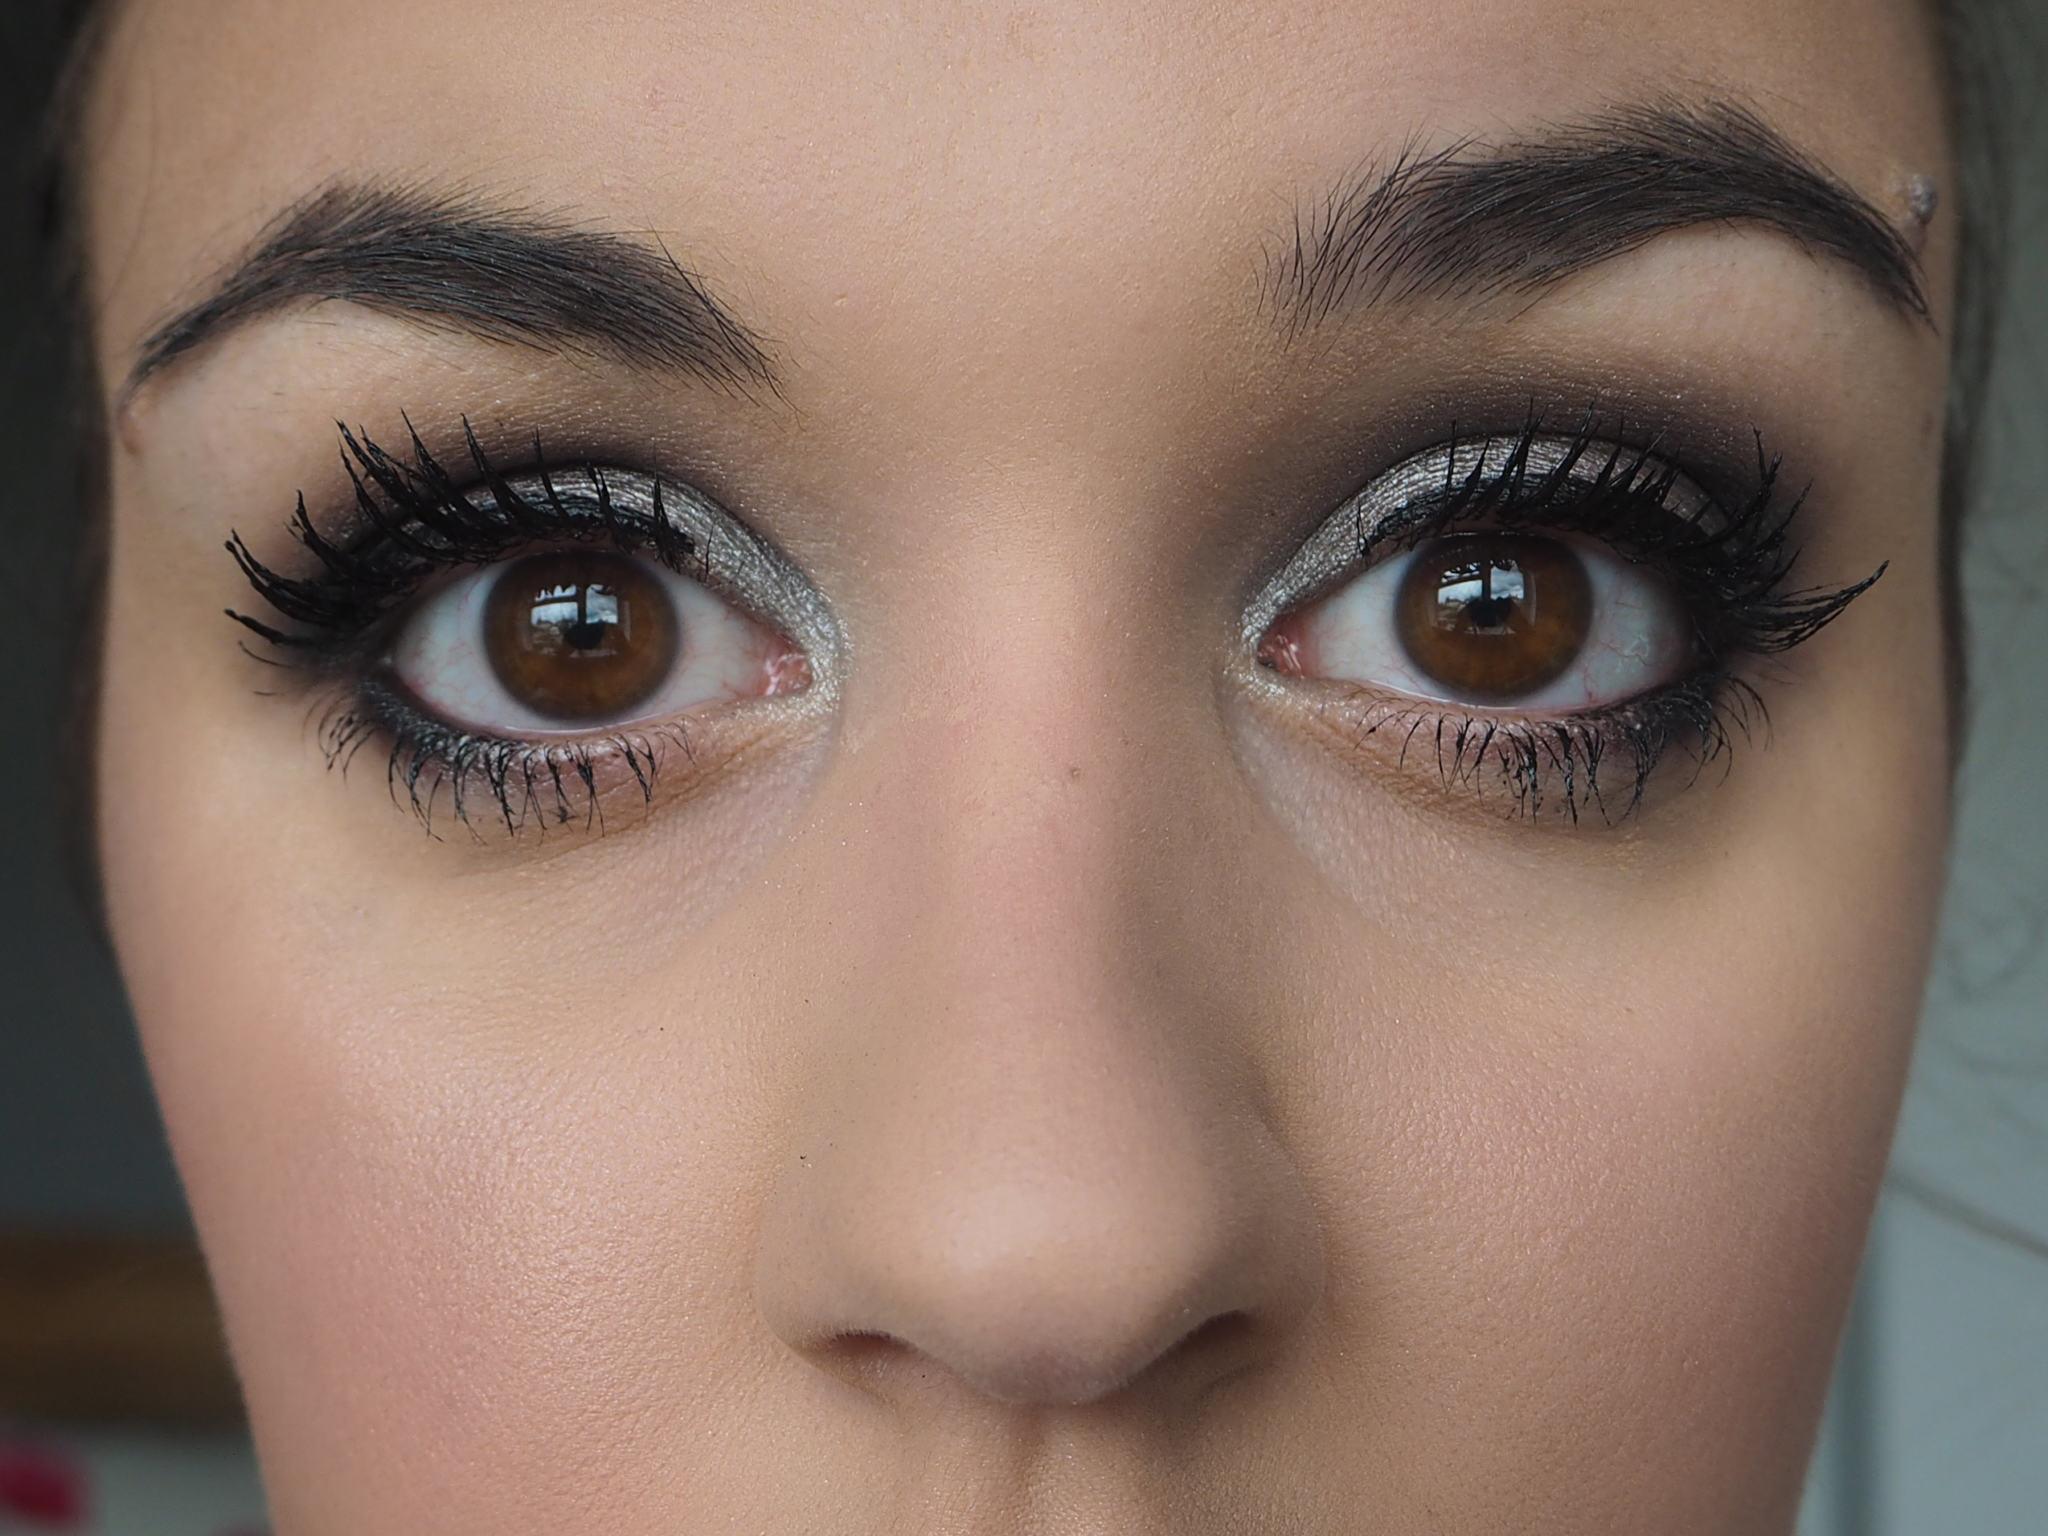 covergirl-supersize-mascara-1-coat-each-eye